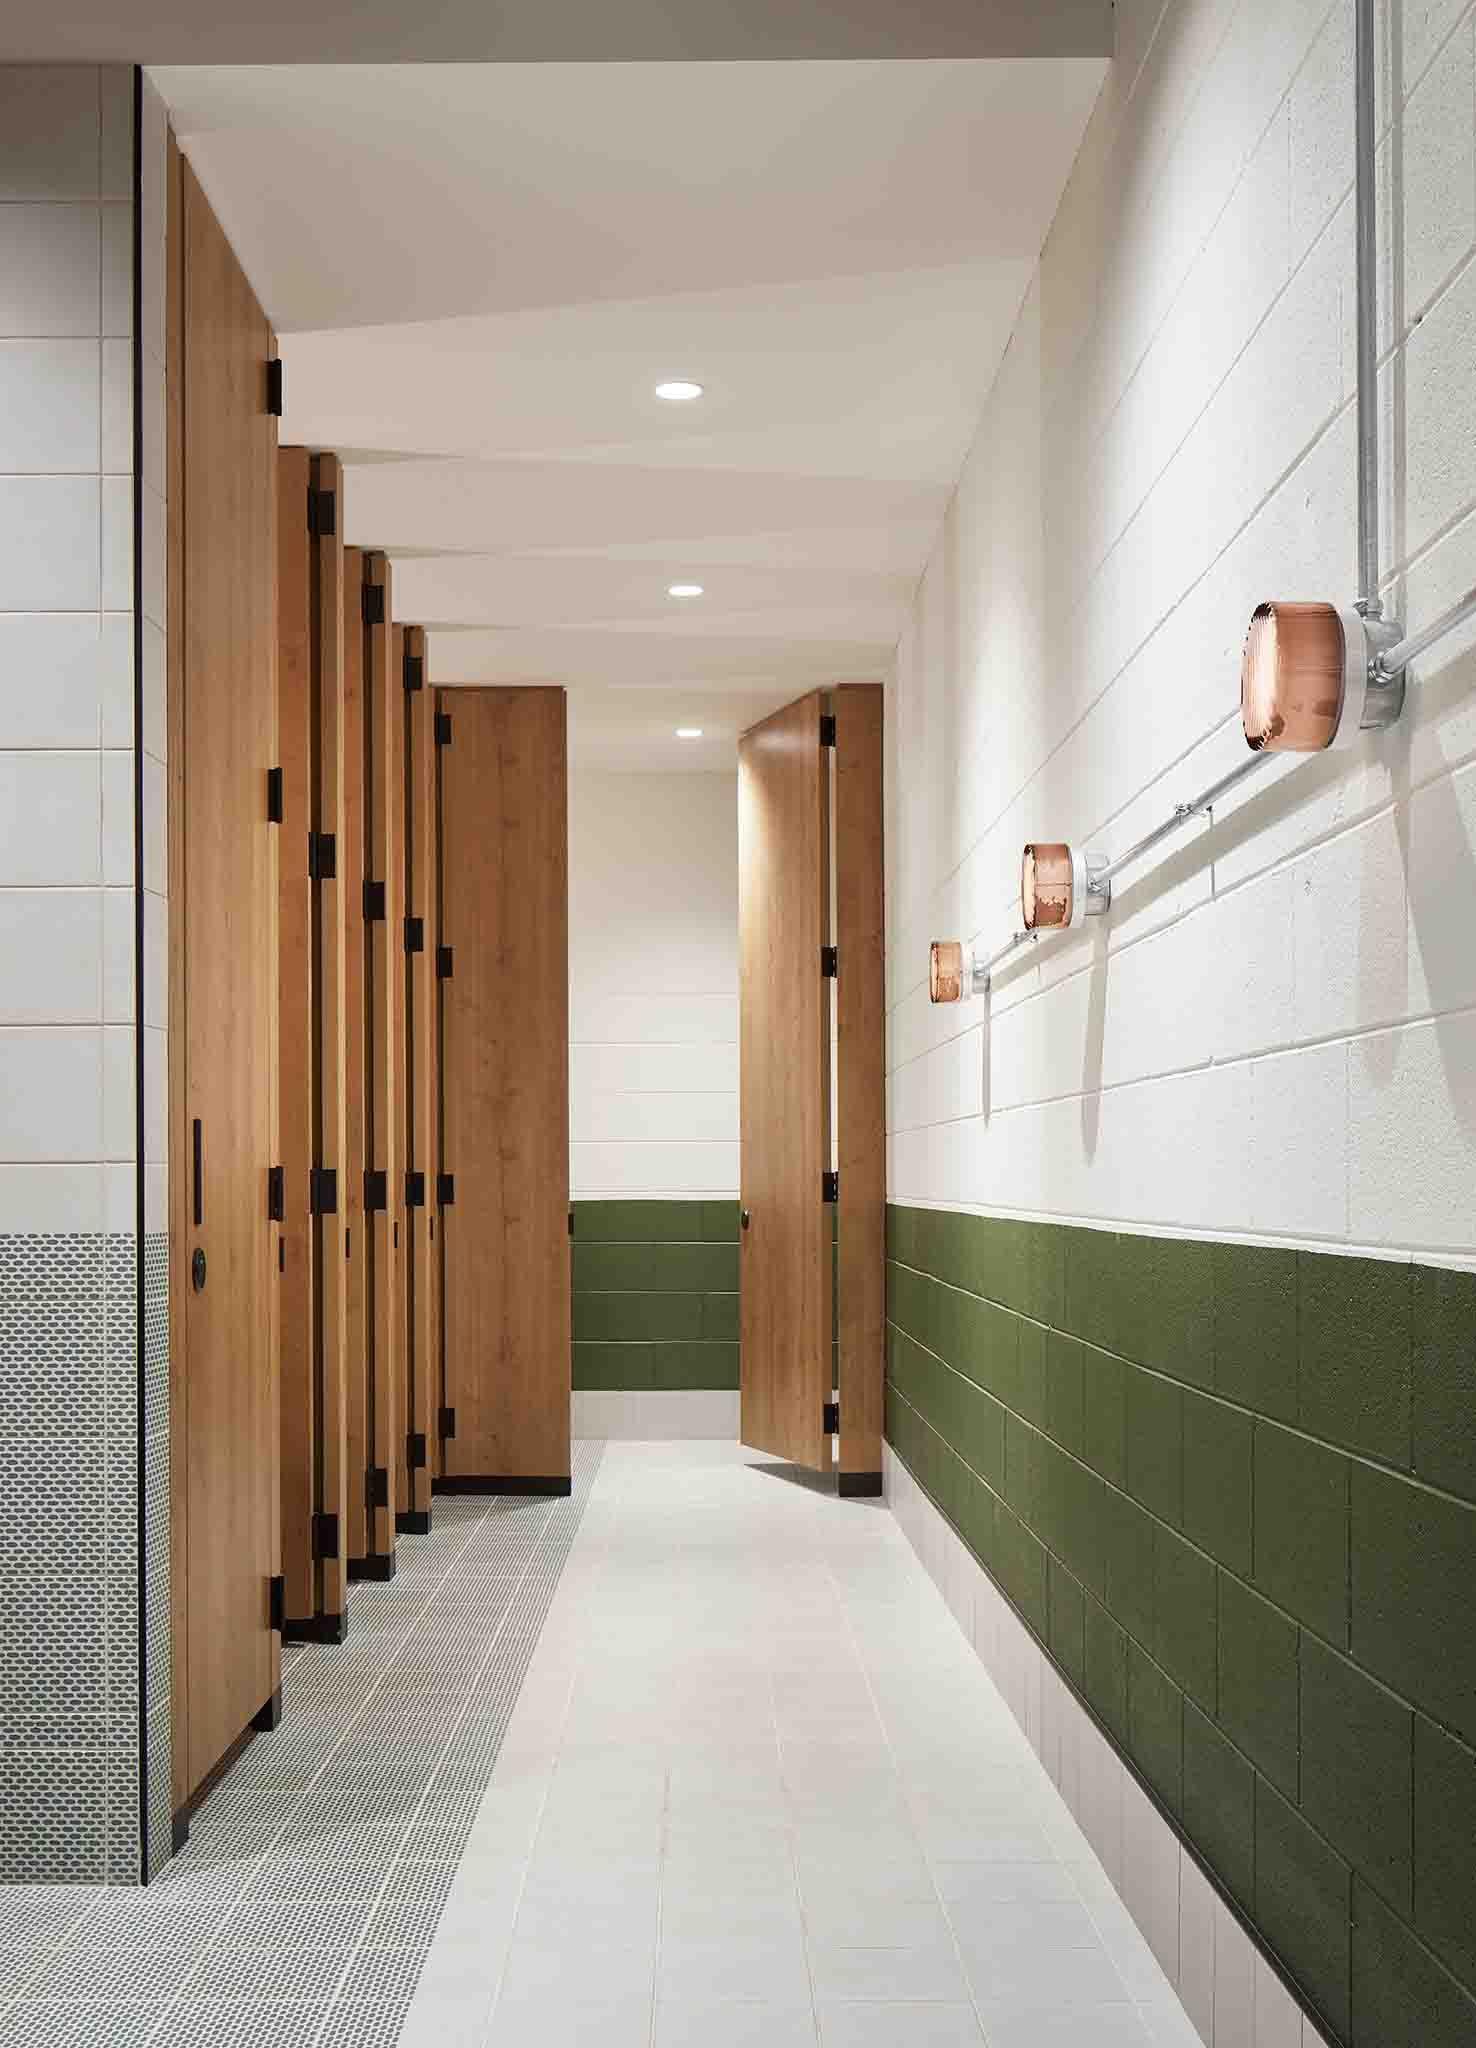 Modern Industrial Bathroom In 2020 Cinder Block Walls Concrete Block Walls Glass Blocks Wall